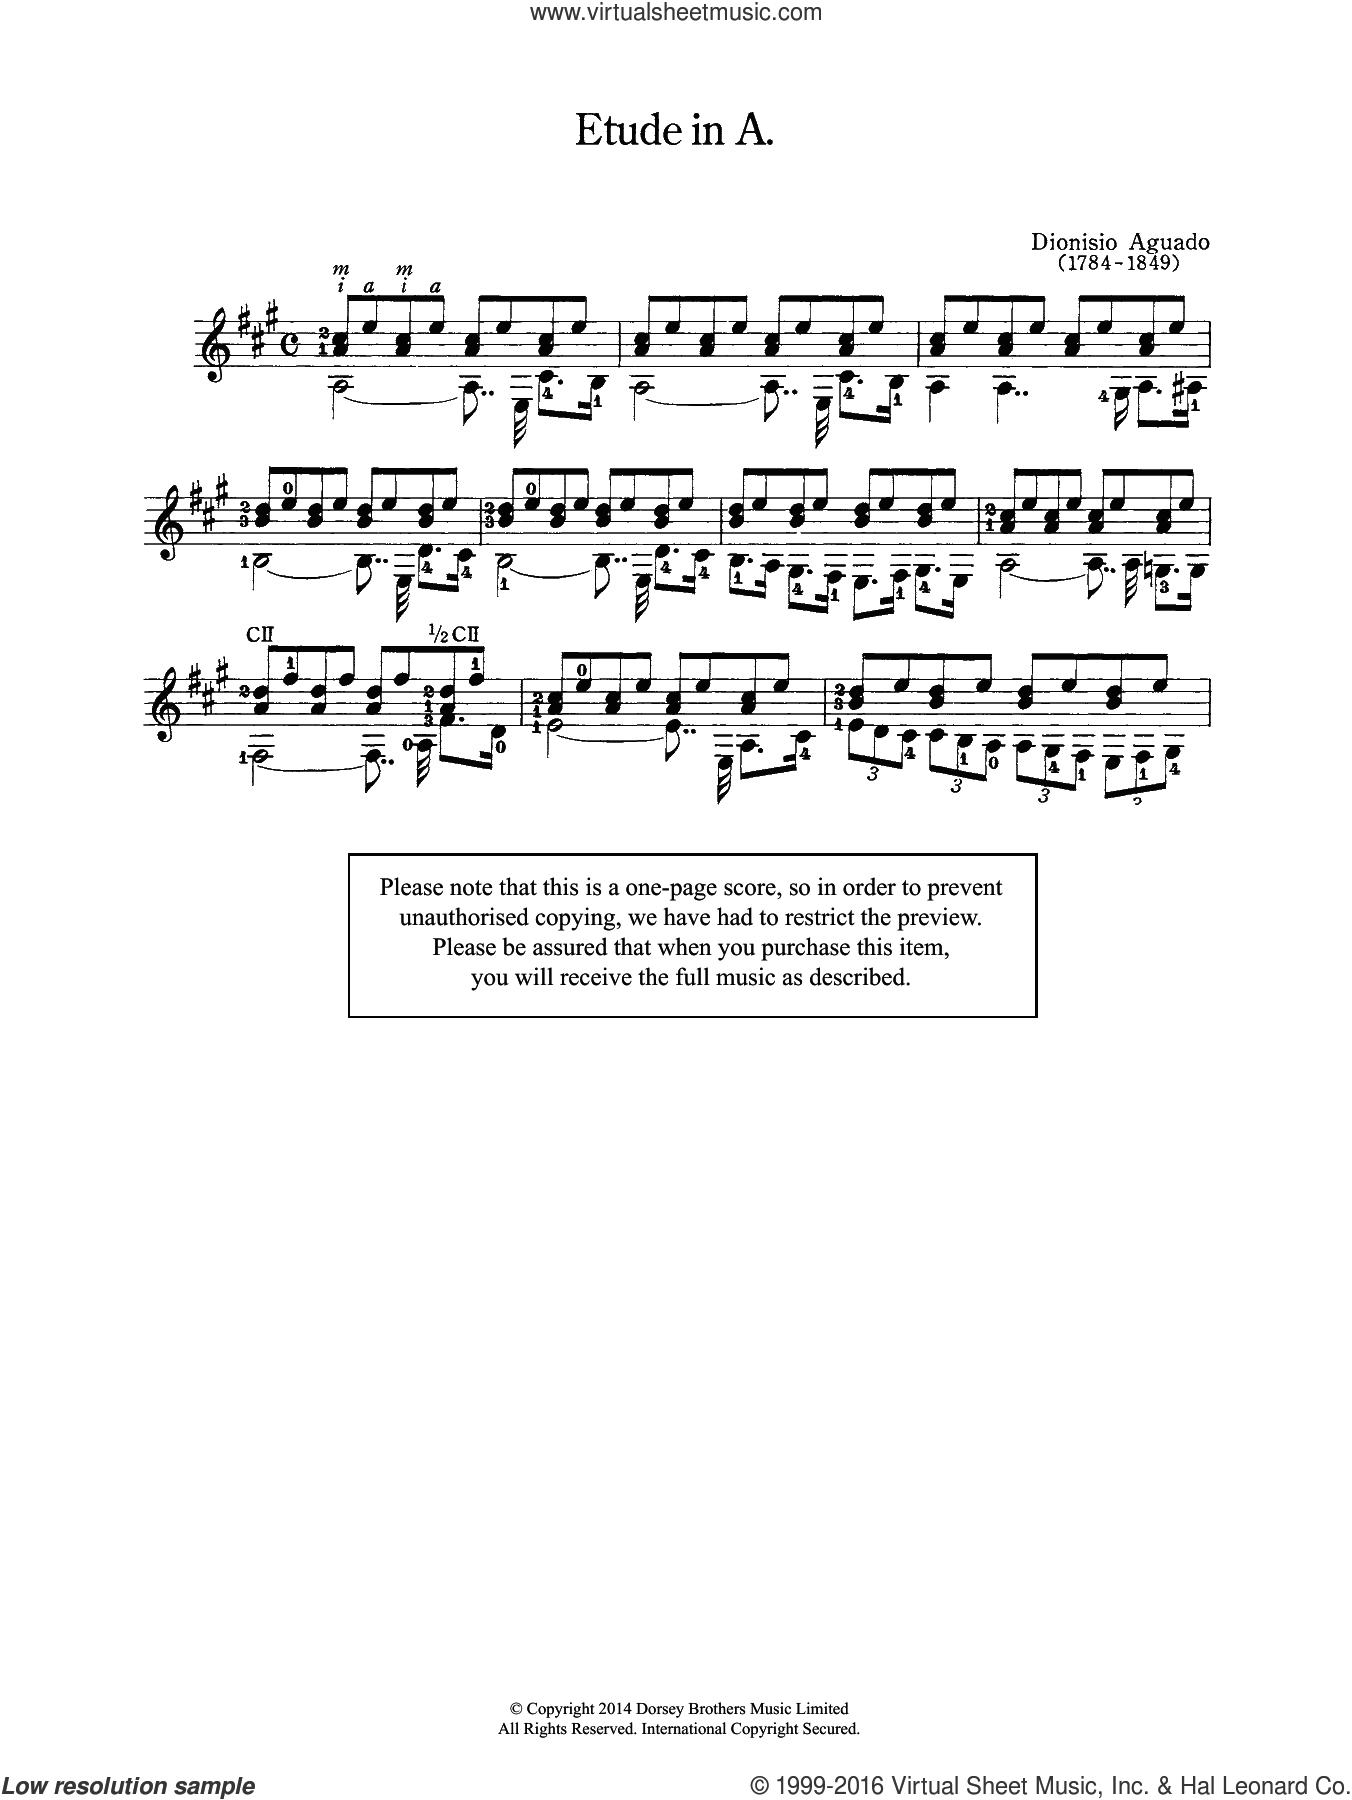 Etude In A sheet music for guitar solo (chords) by Garcia Dionisio Aguado, classical score, easy guitar (chords)